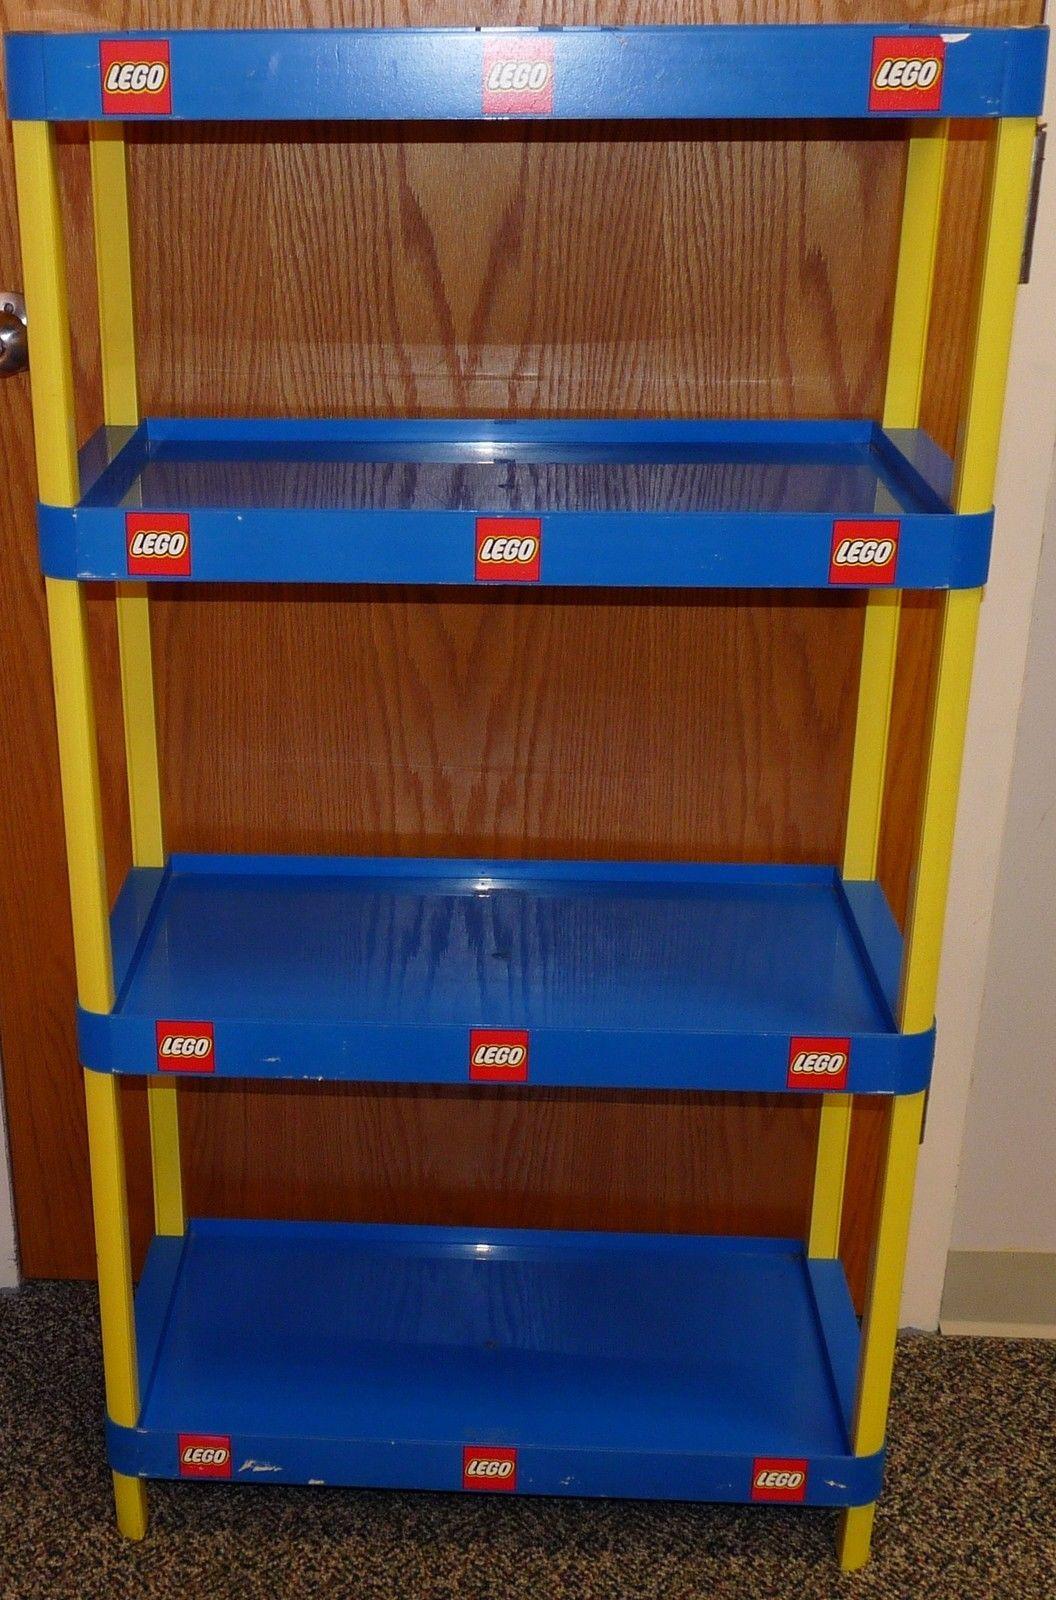 Lego Toy Store Advertising Display Shelf Ebay Displays